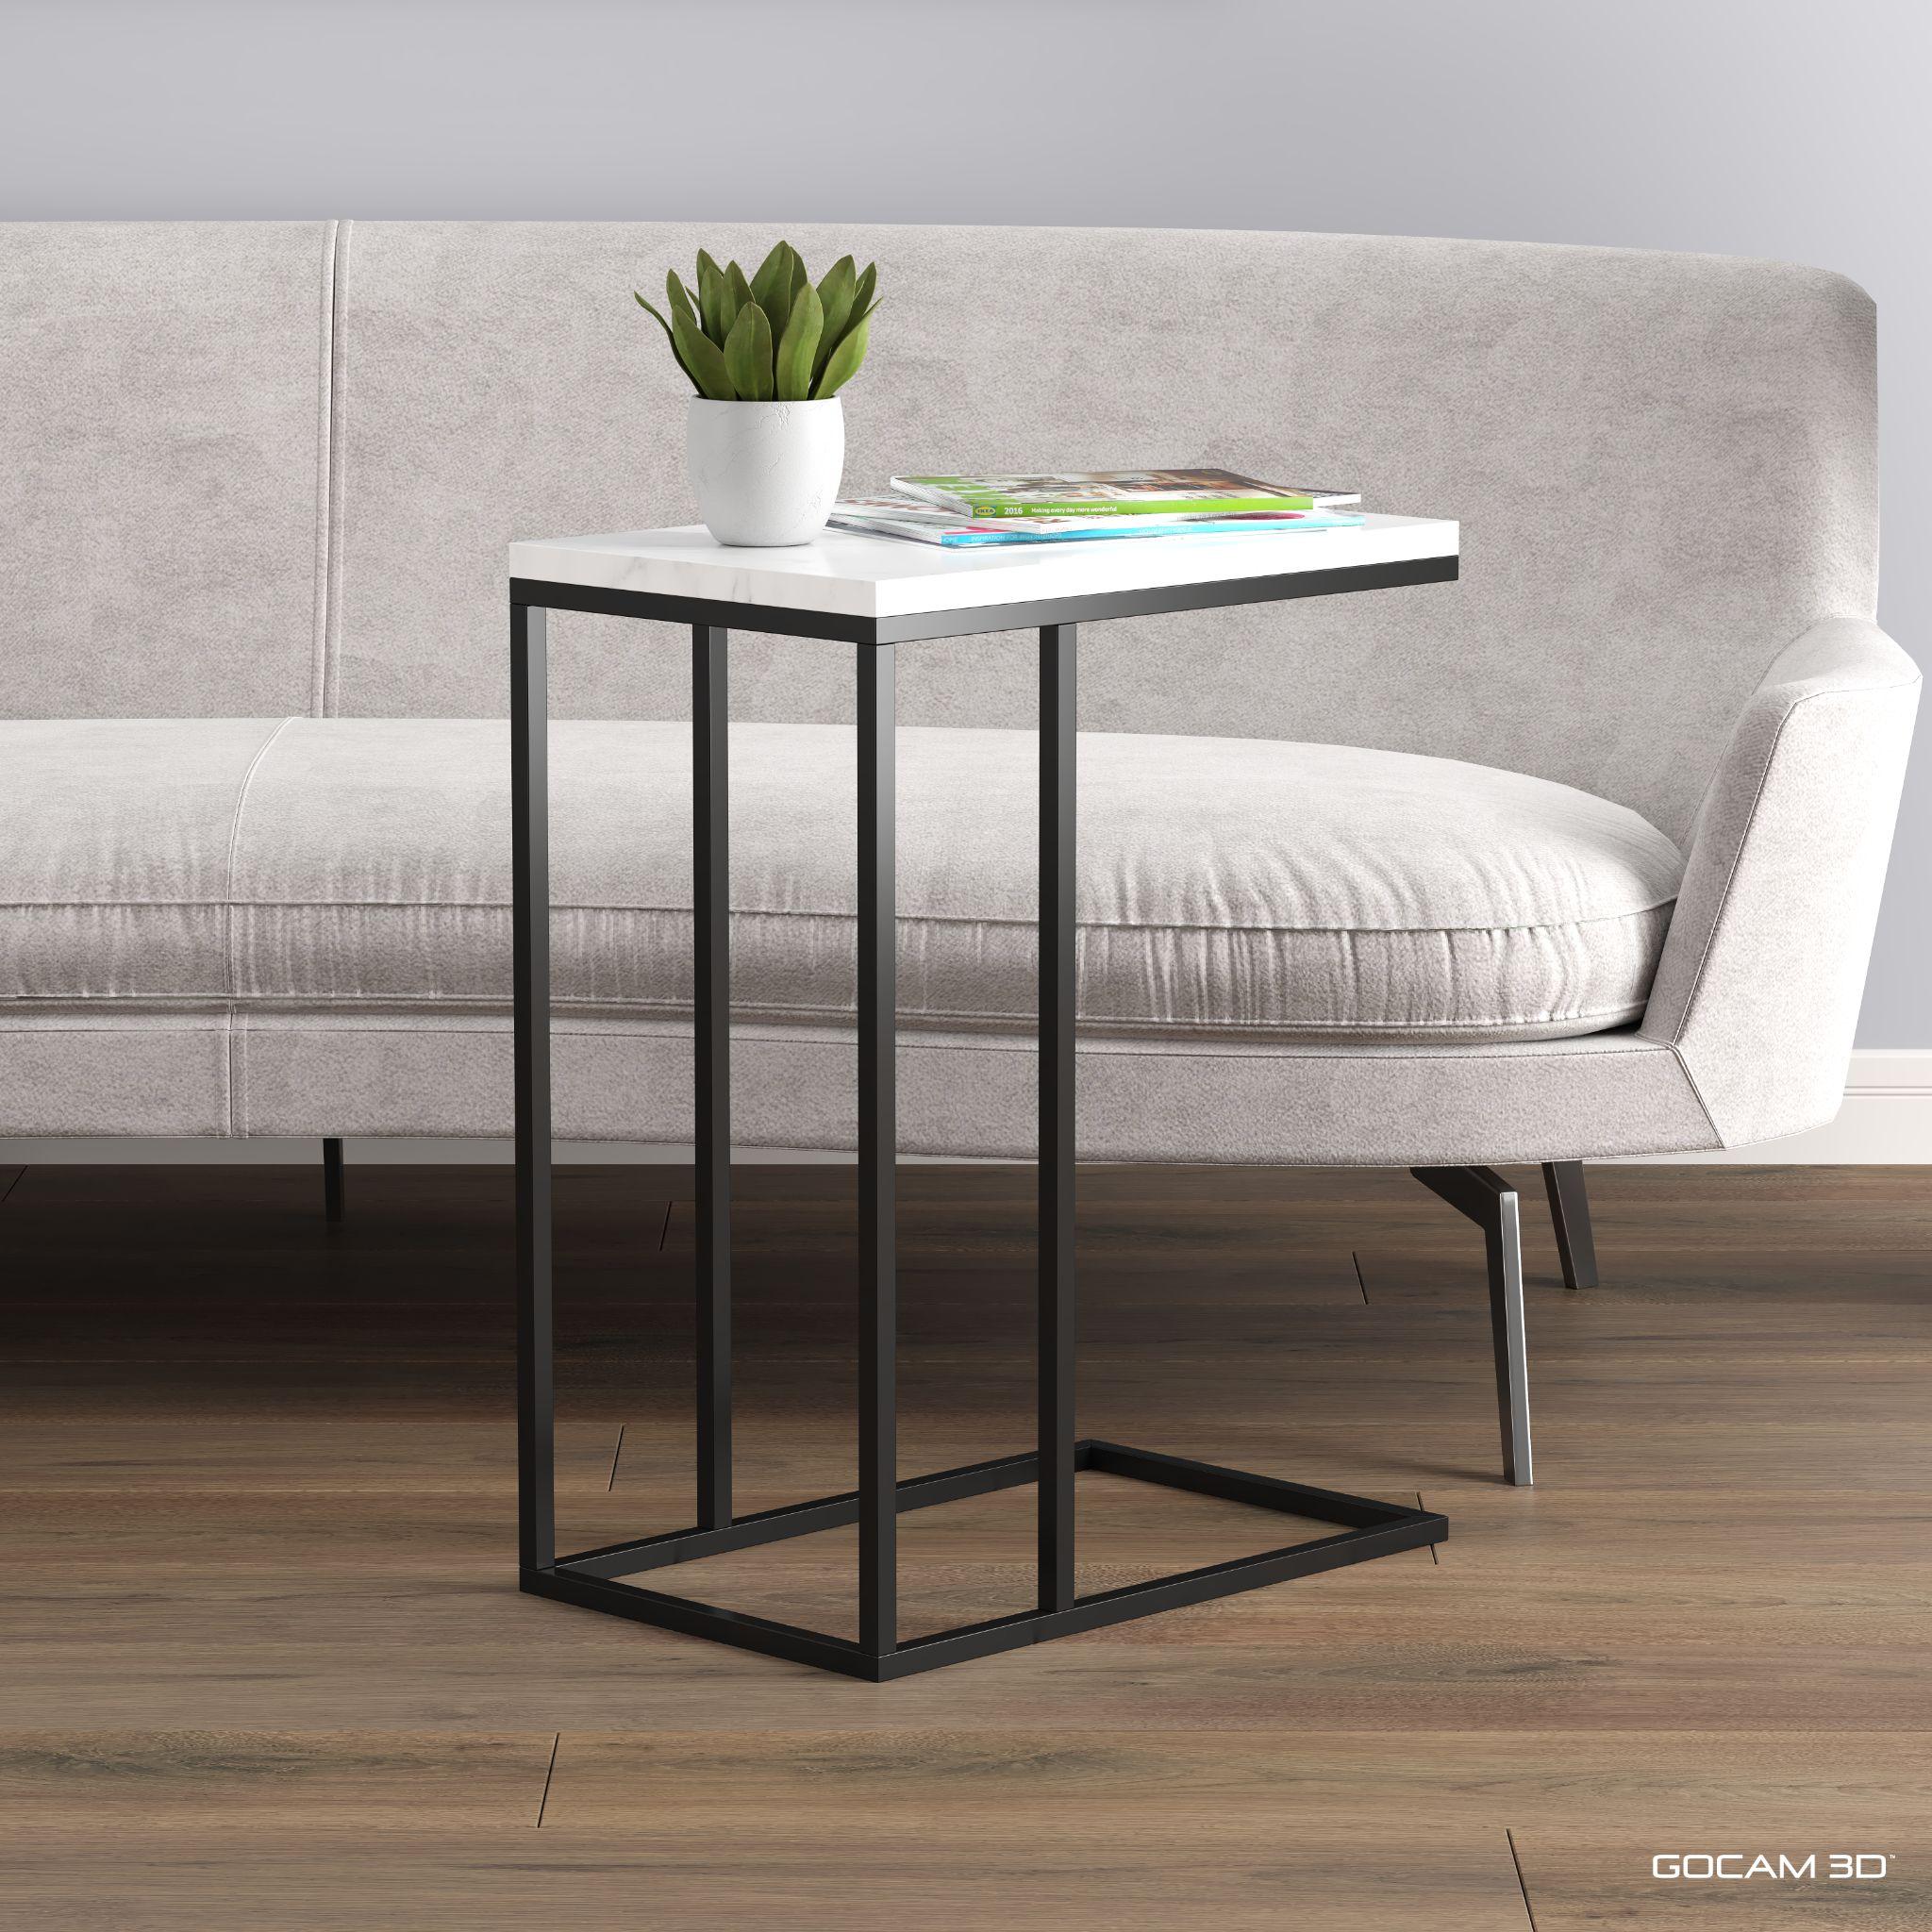 Living room end table design. Table de salon moderne. 3D renderings, rendus 3D: GOCAM3D www.gocam.ca